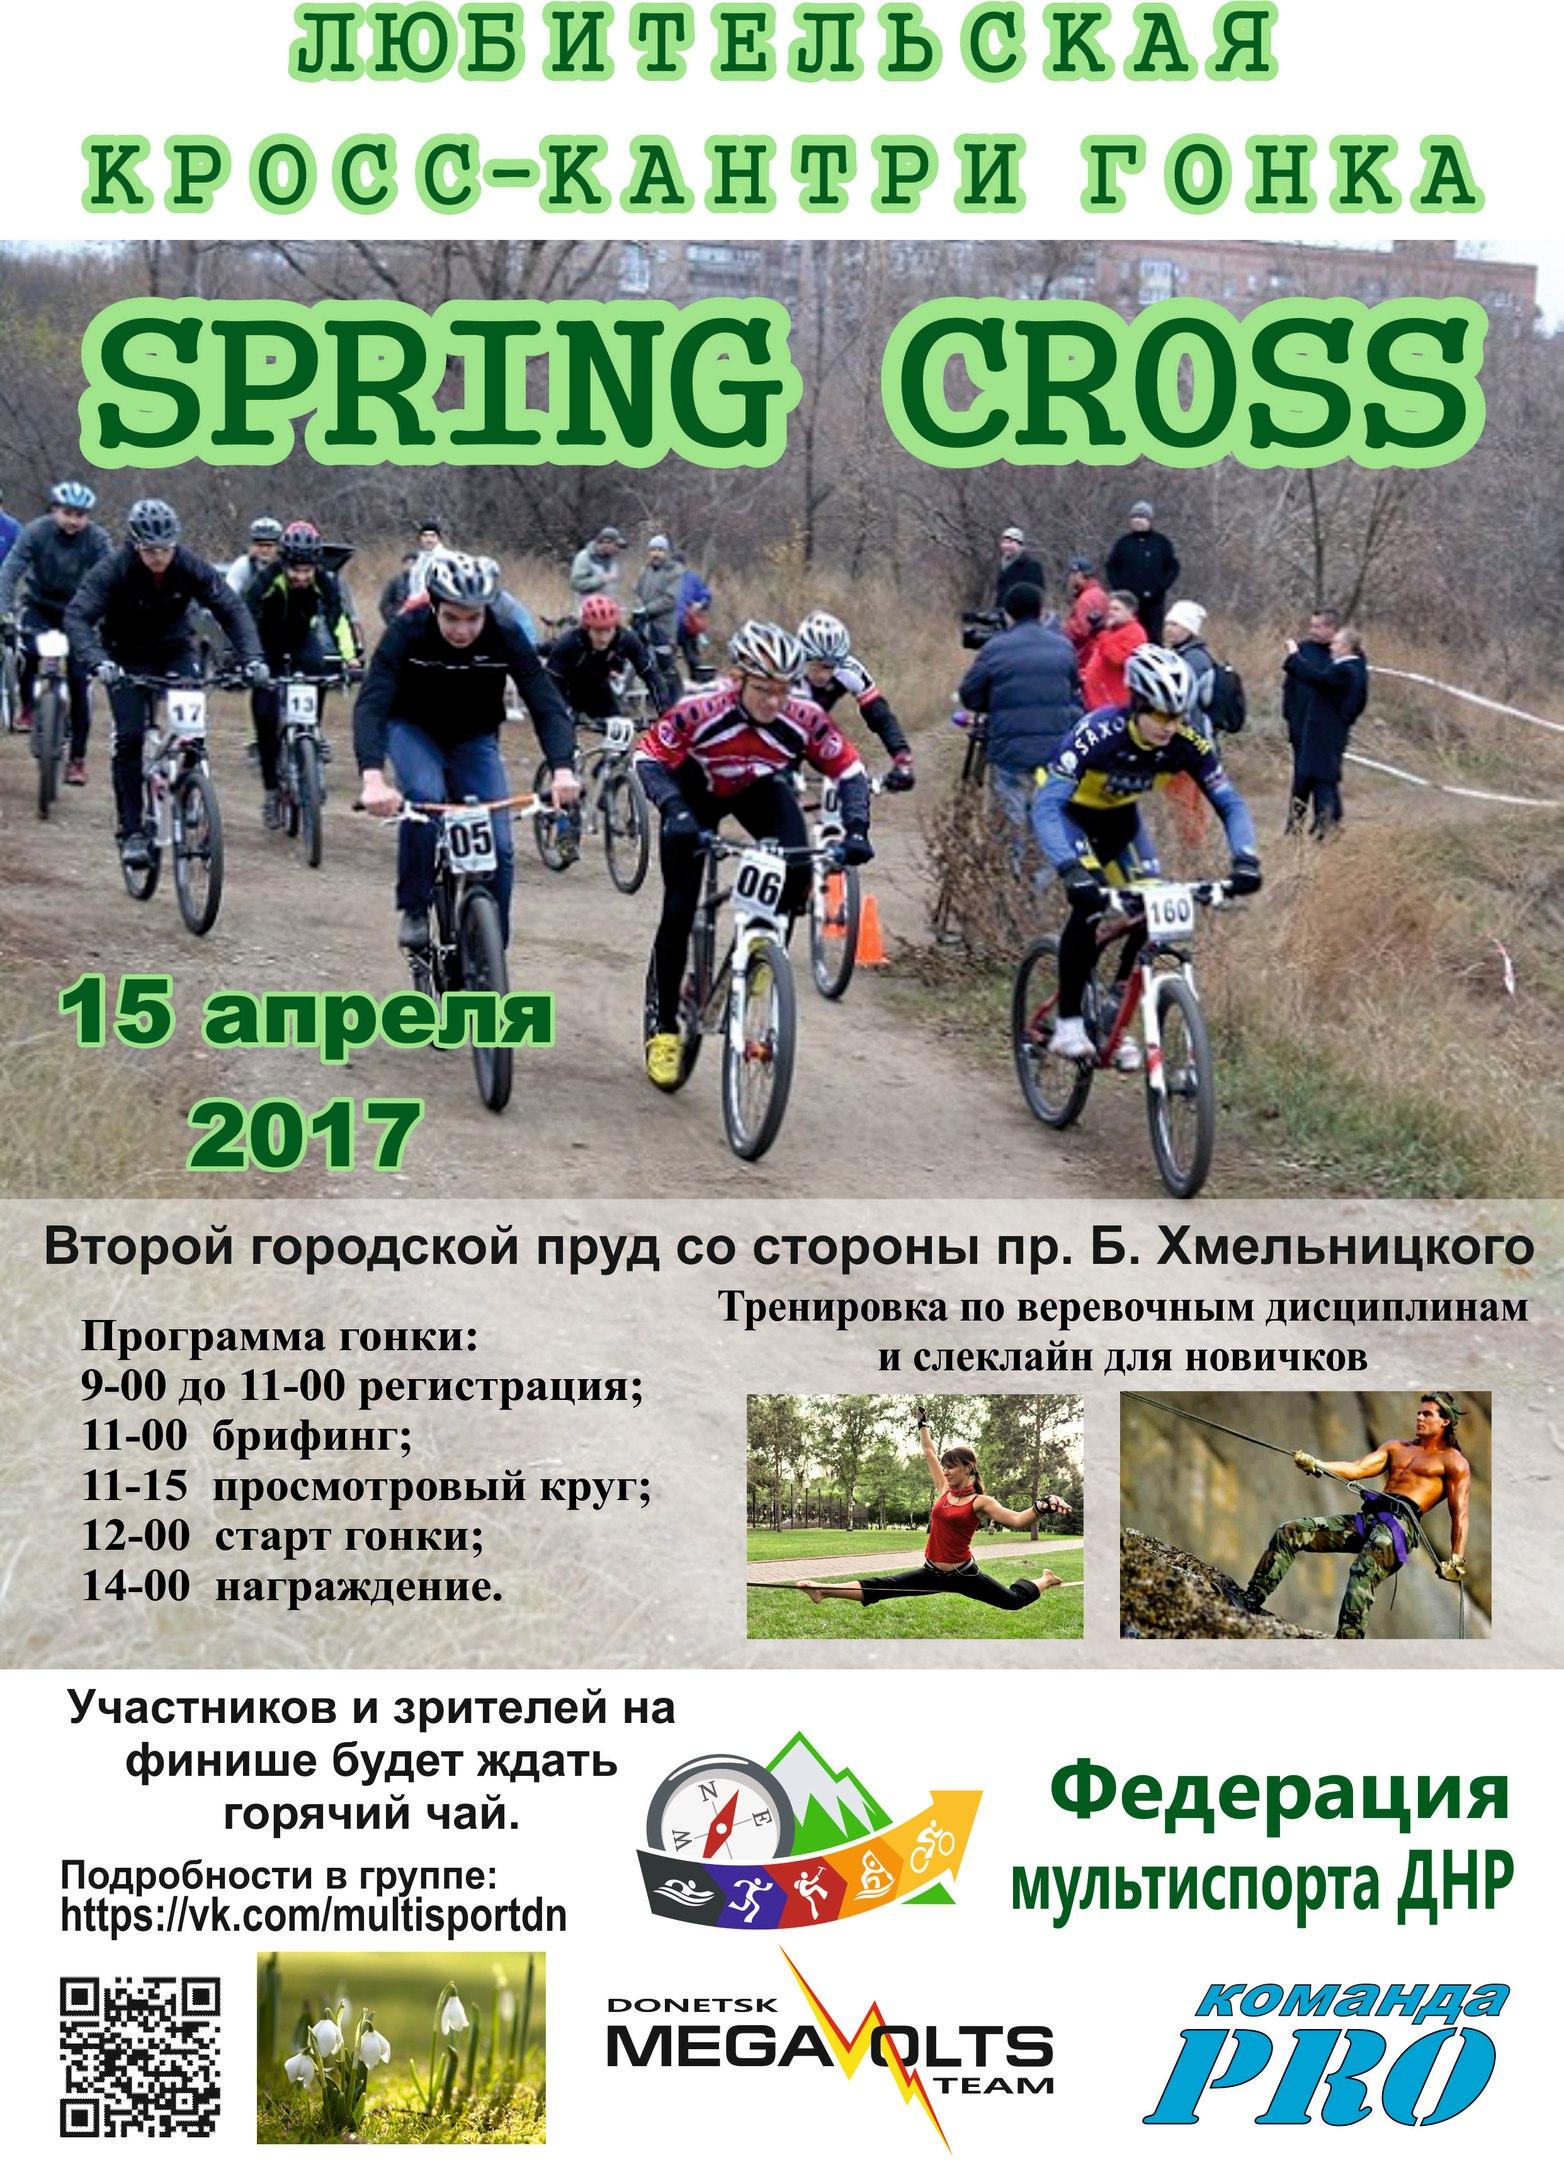 Spring Cross 2017